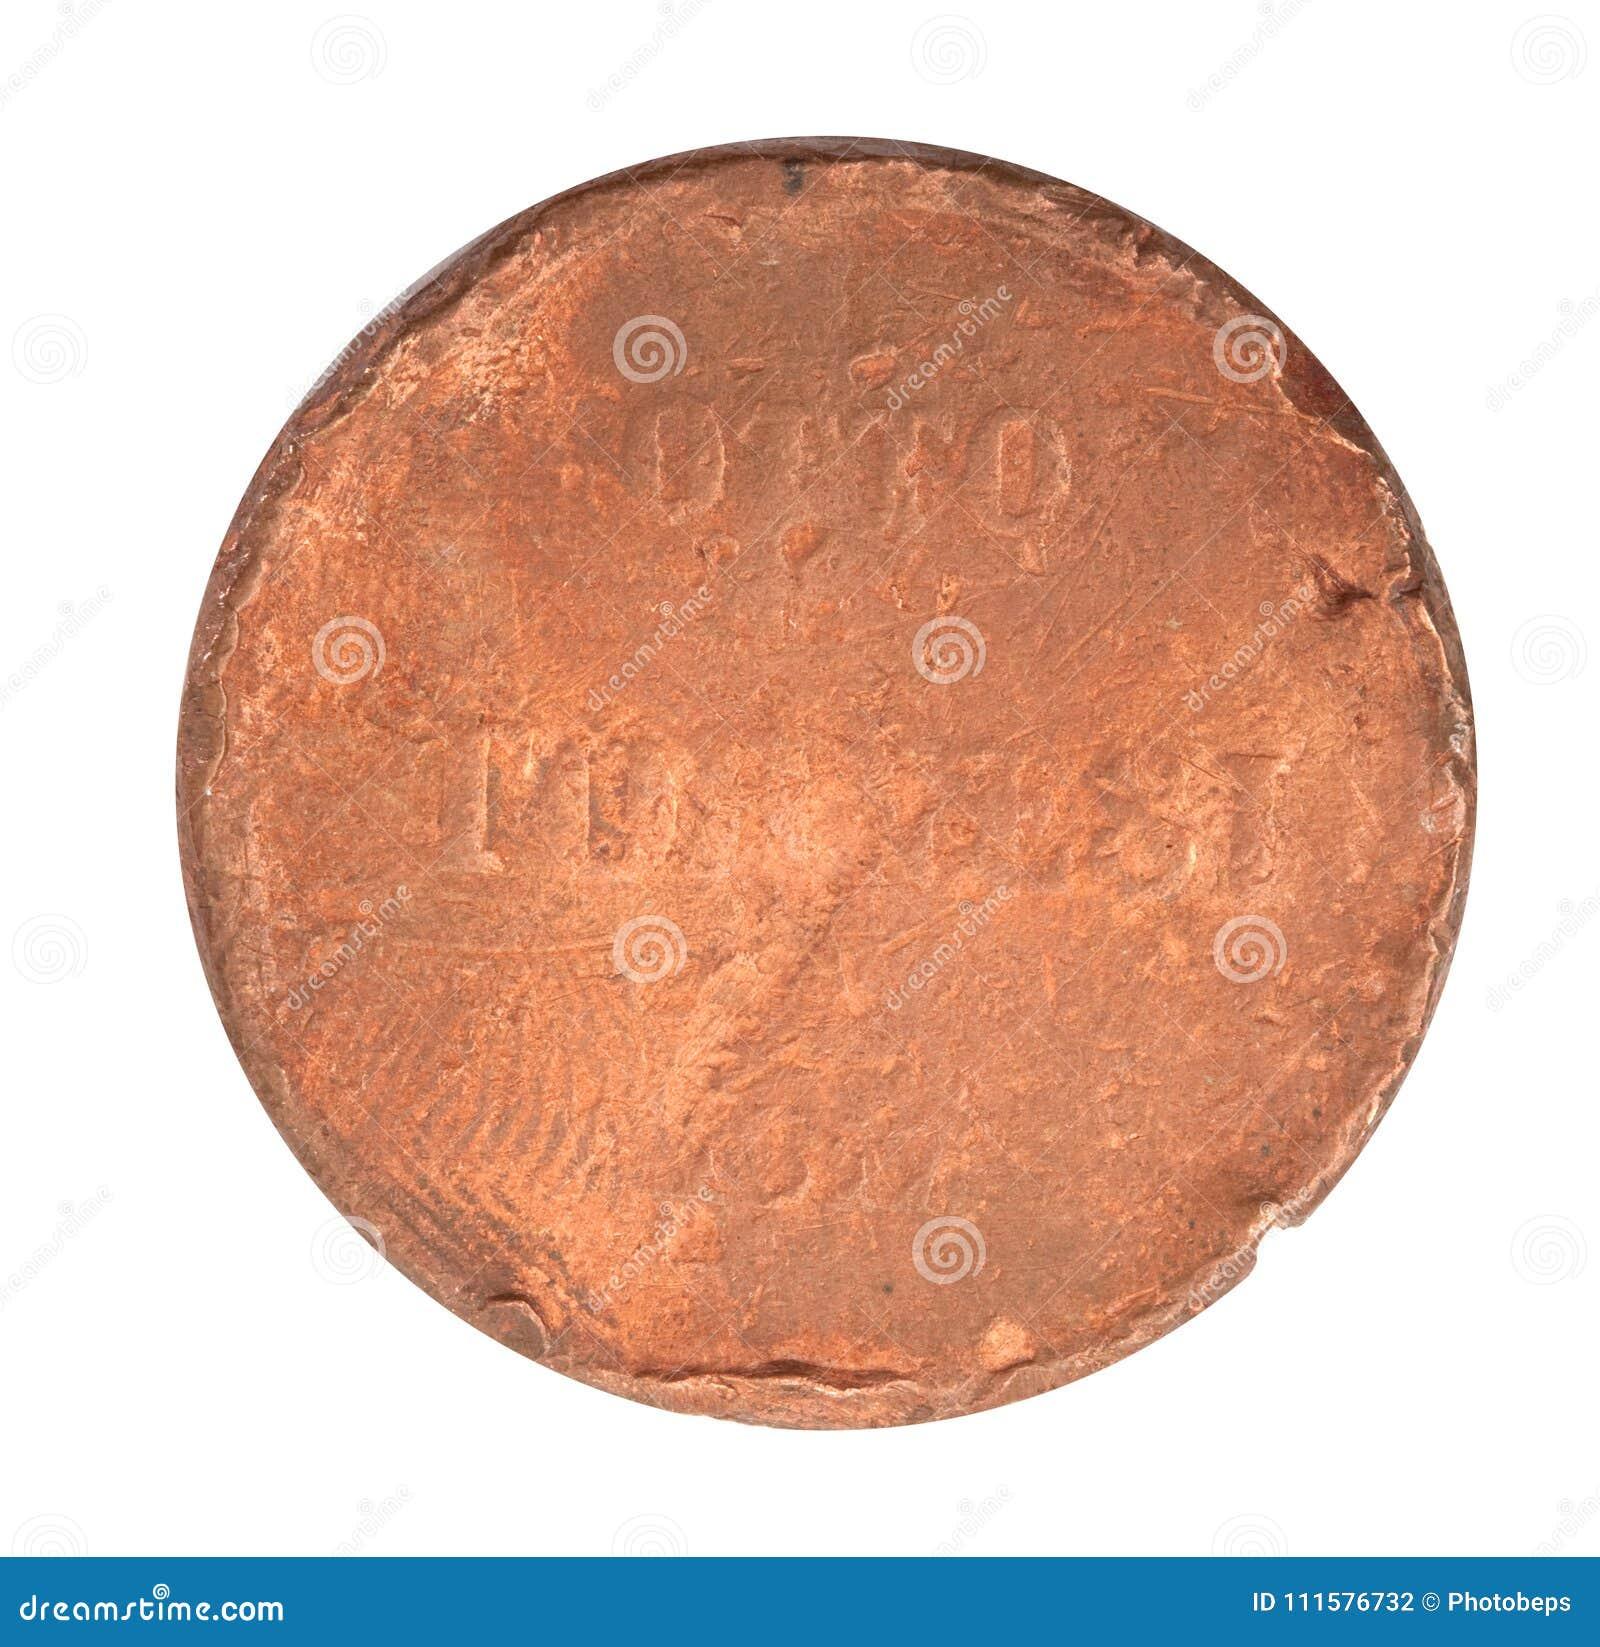 Moneta d annata del metallo nel fondo bianco